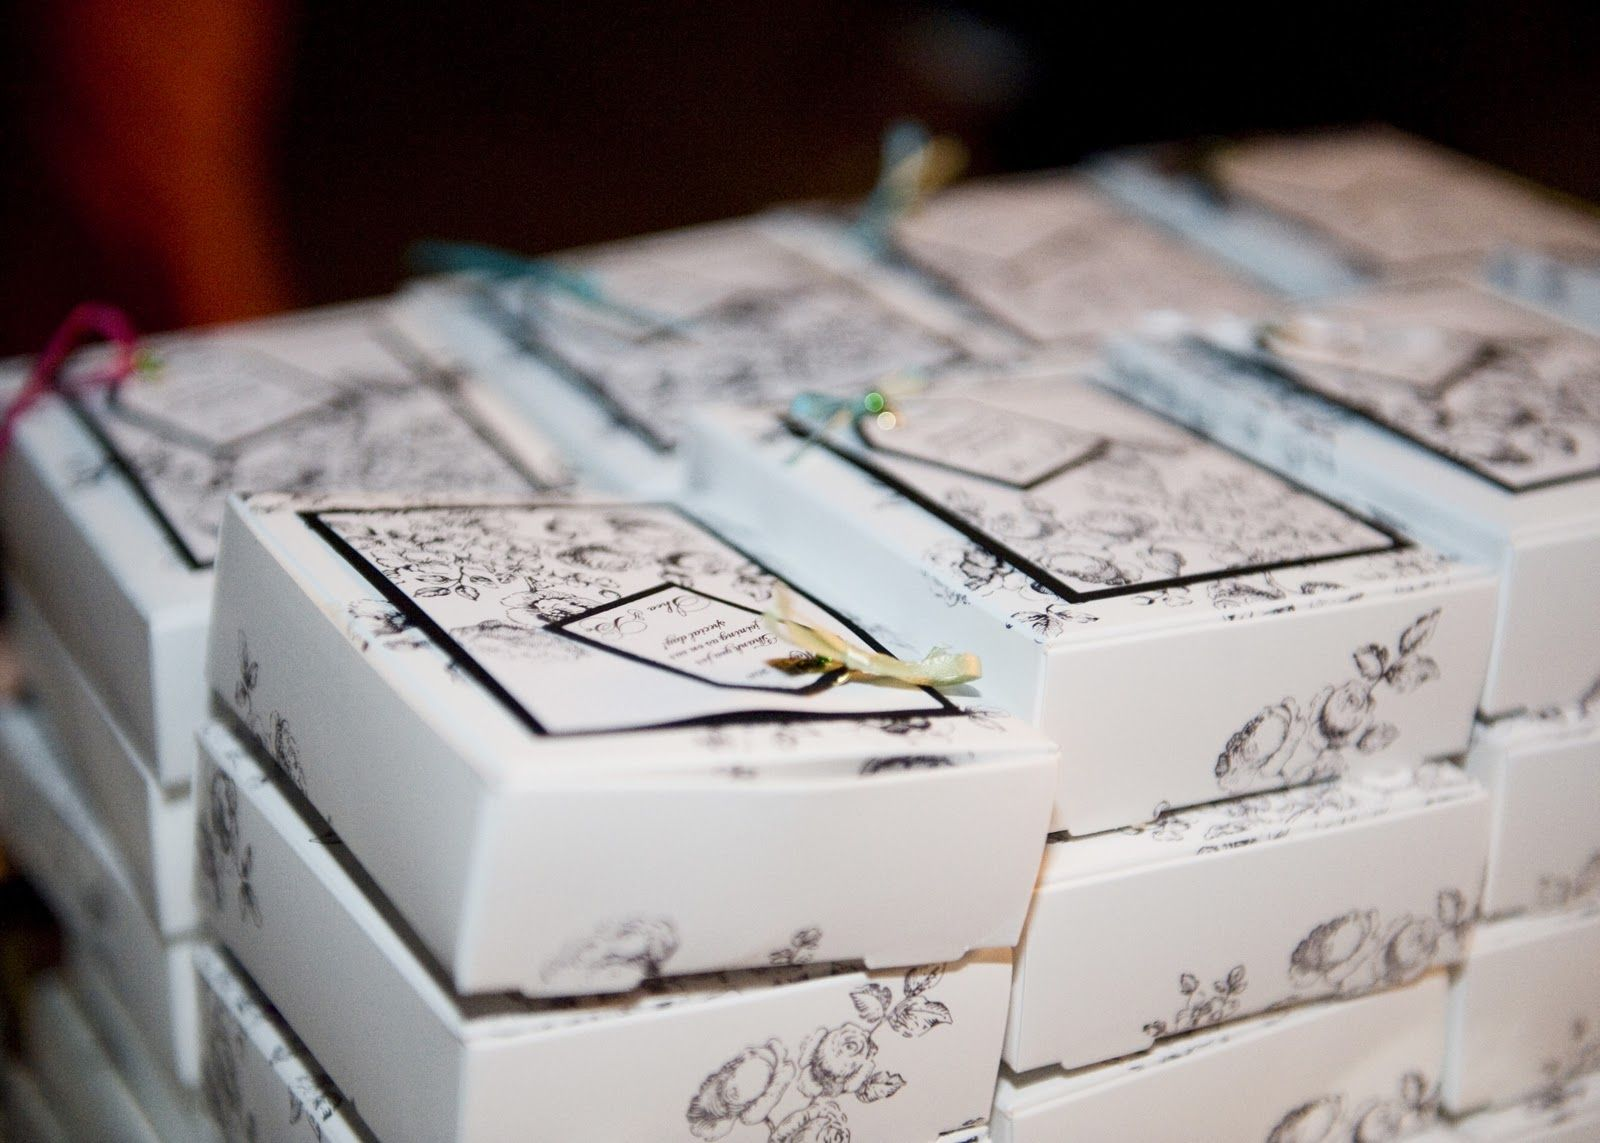 take home boxes for wedding cake - Google Search   Wedding Ideas ...